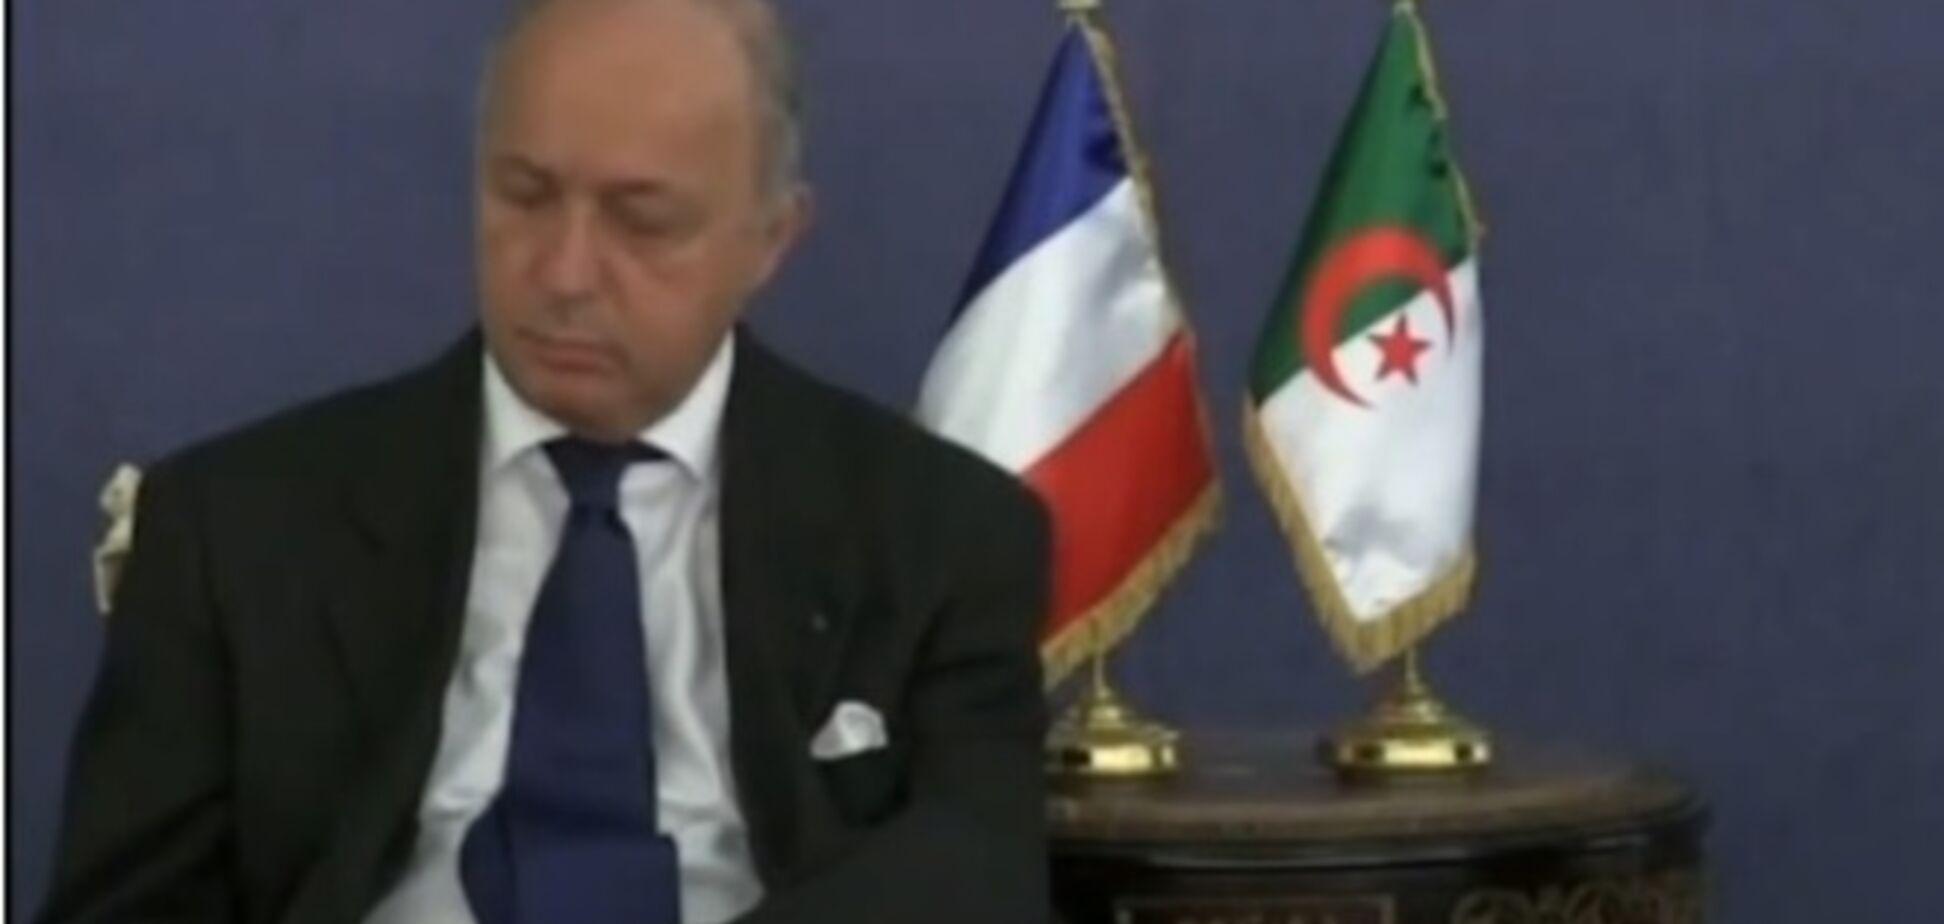 Французский министр уснул во время переговоров